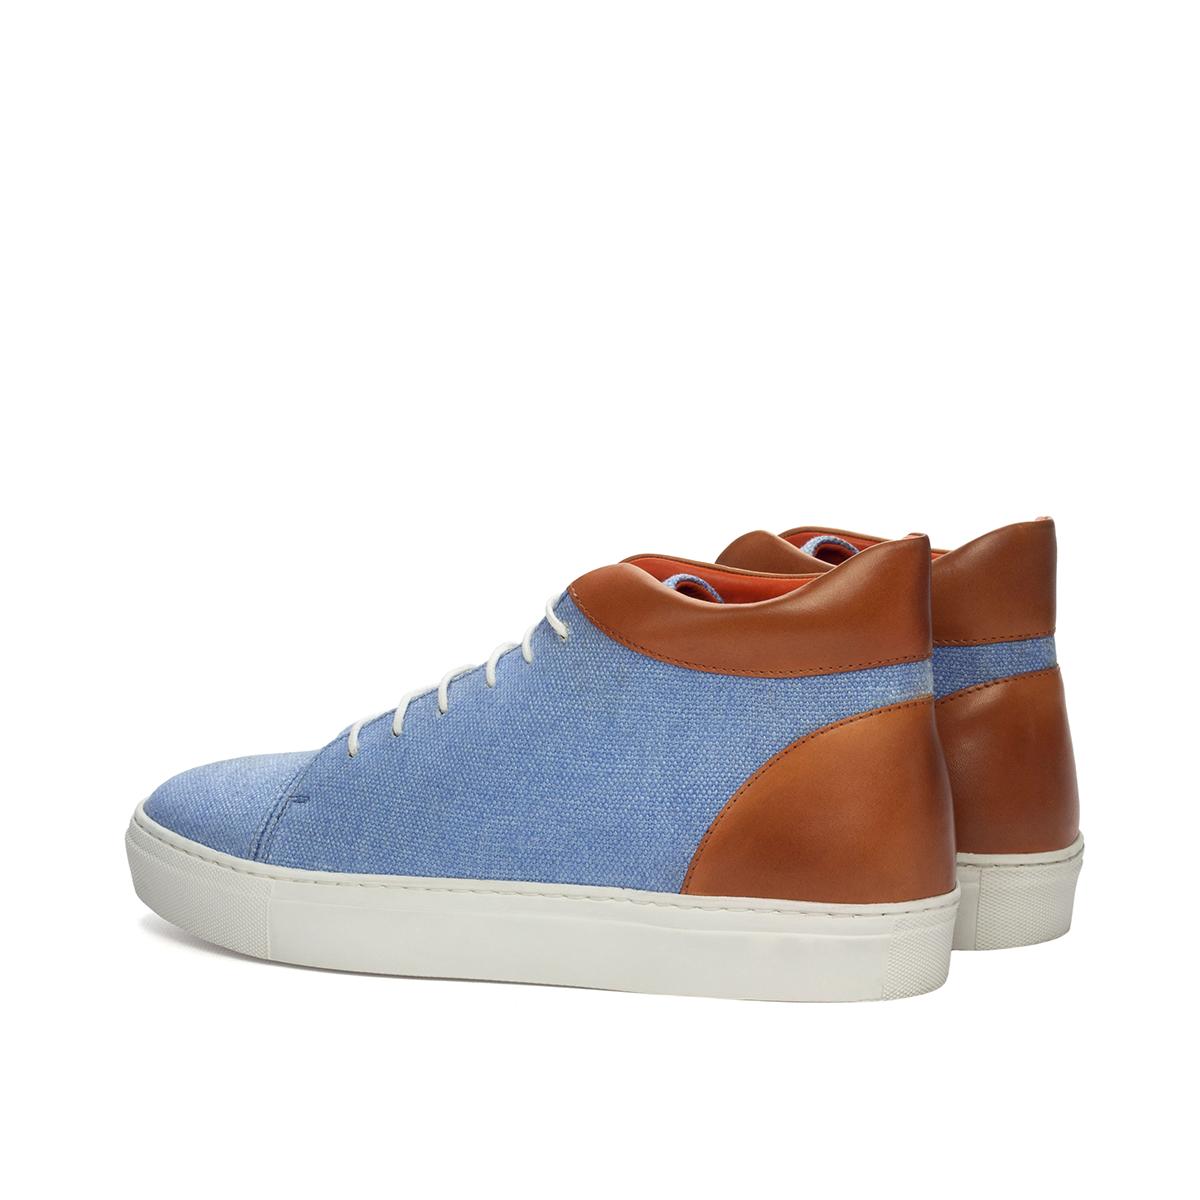 Blue linen high-top sneakers